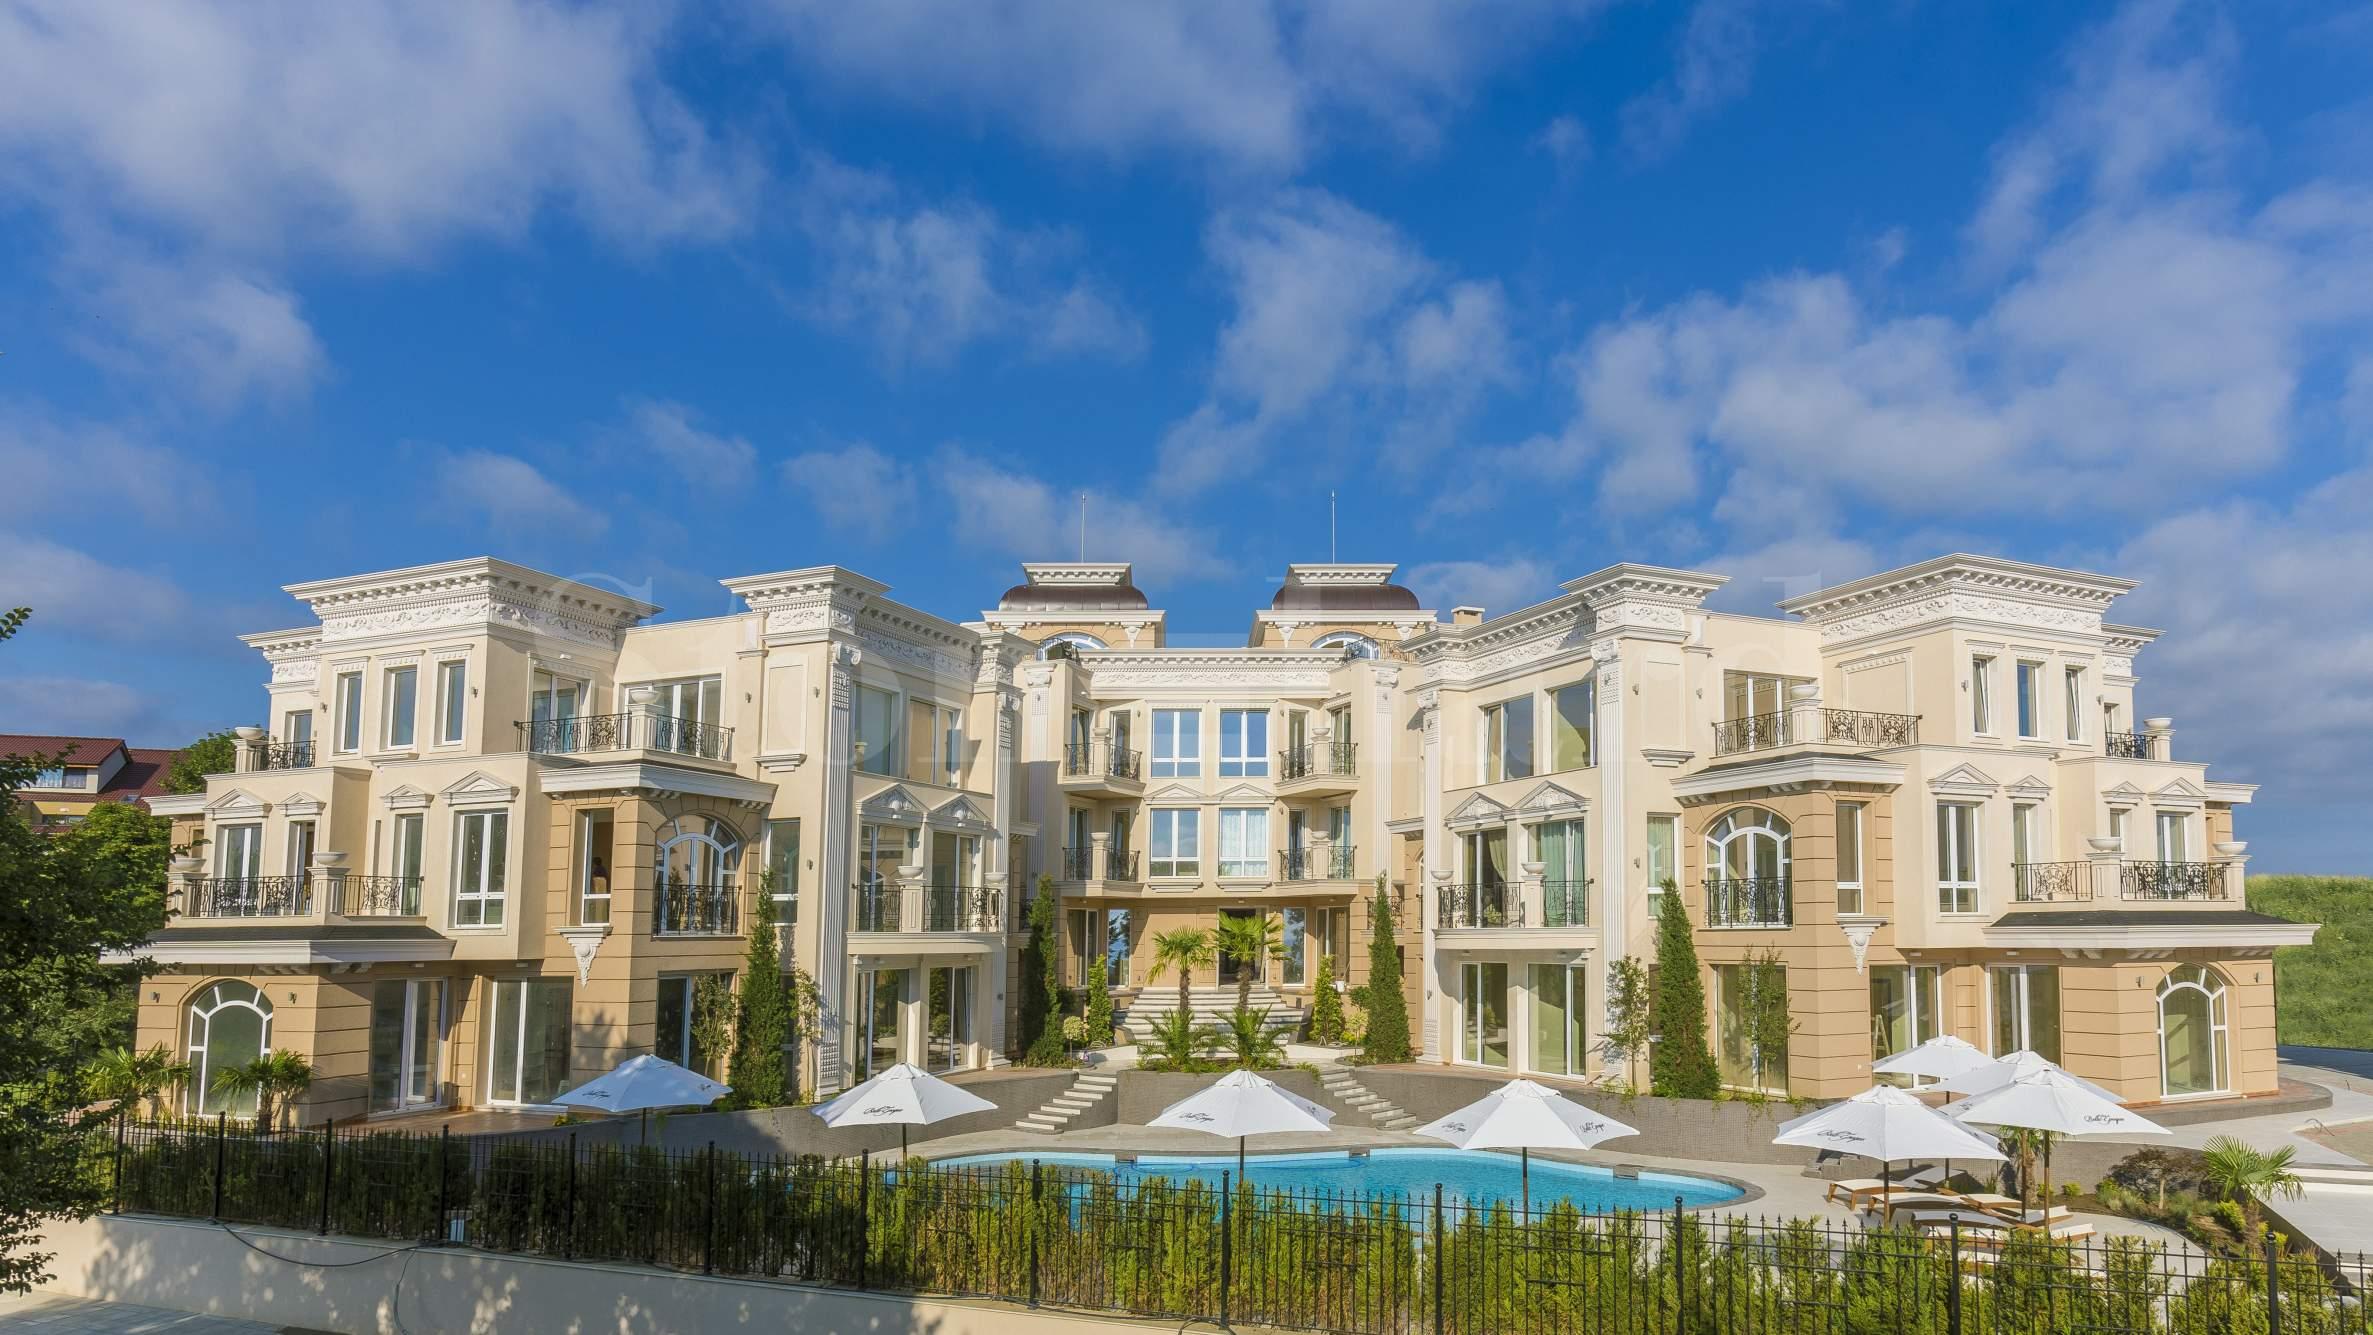 Луксозни апартаменти в морска резиденция Belle Époque1 - Stonehard